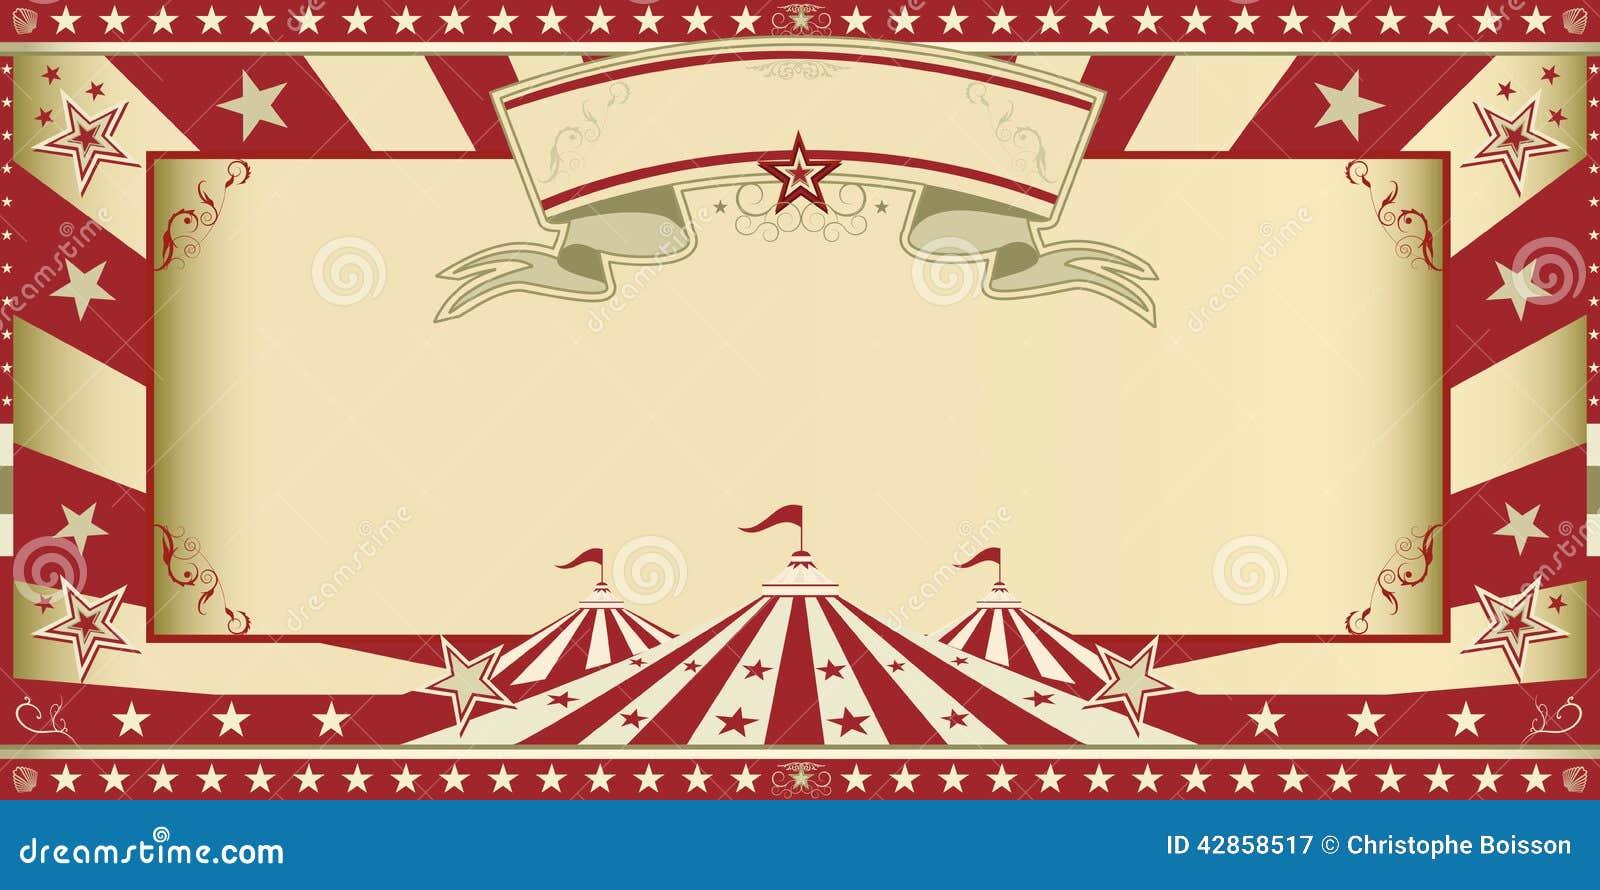 Carnival Party Invitation as luxury invitation example